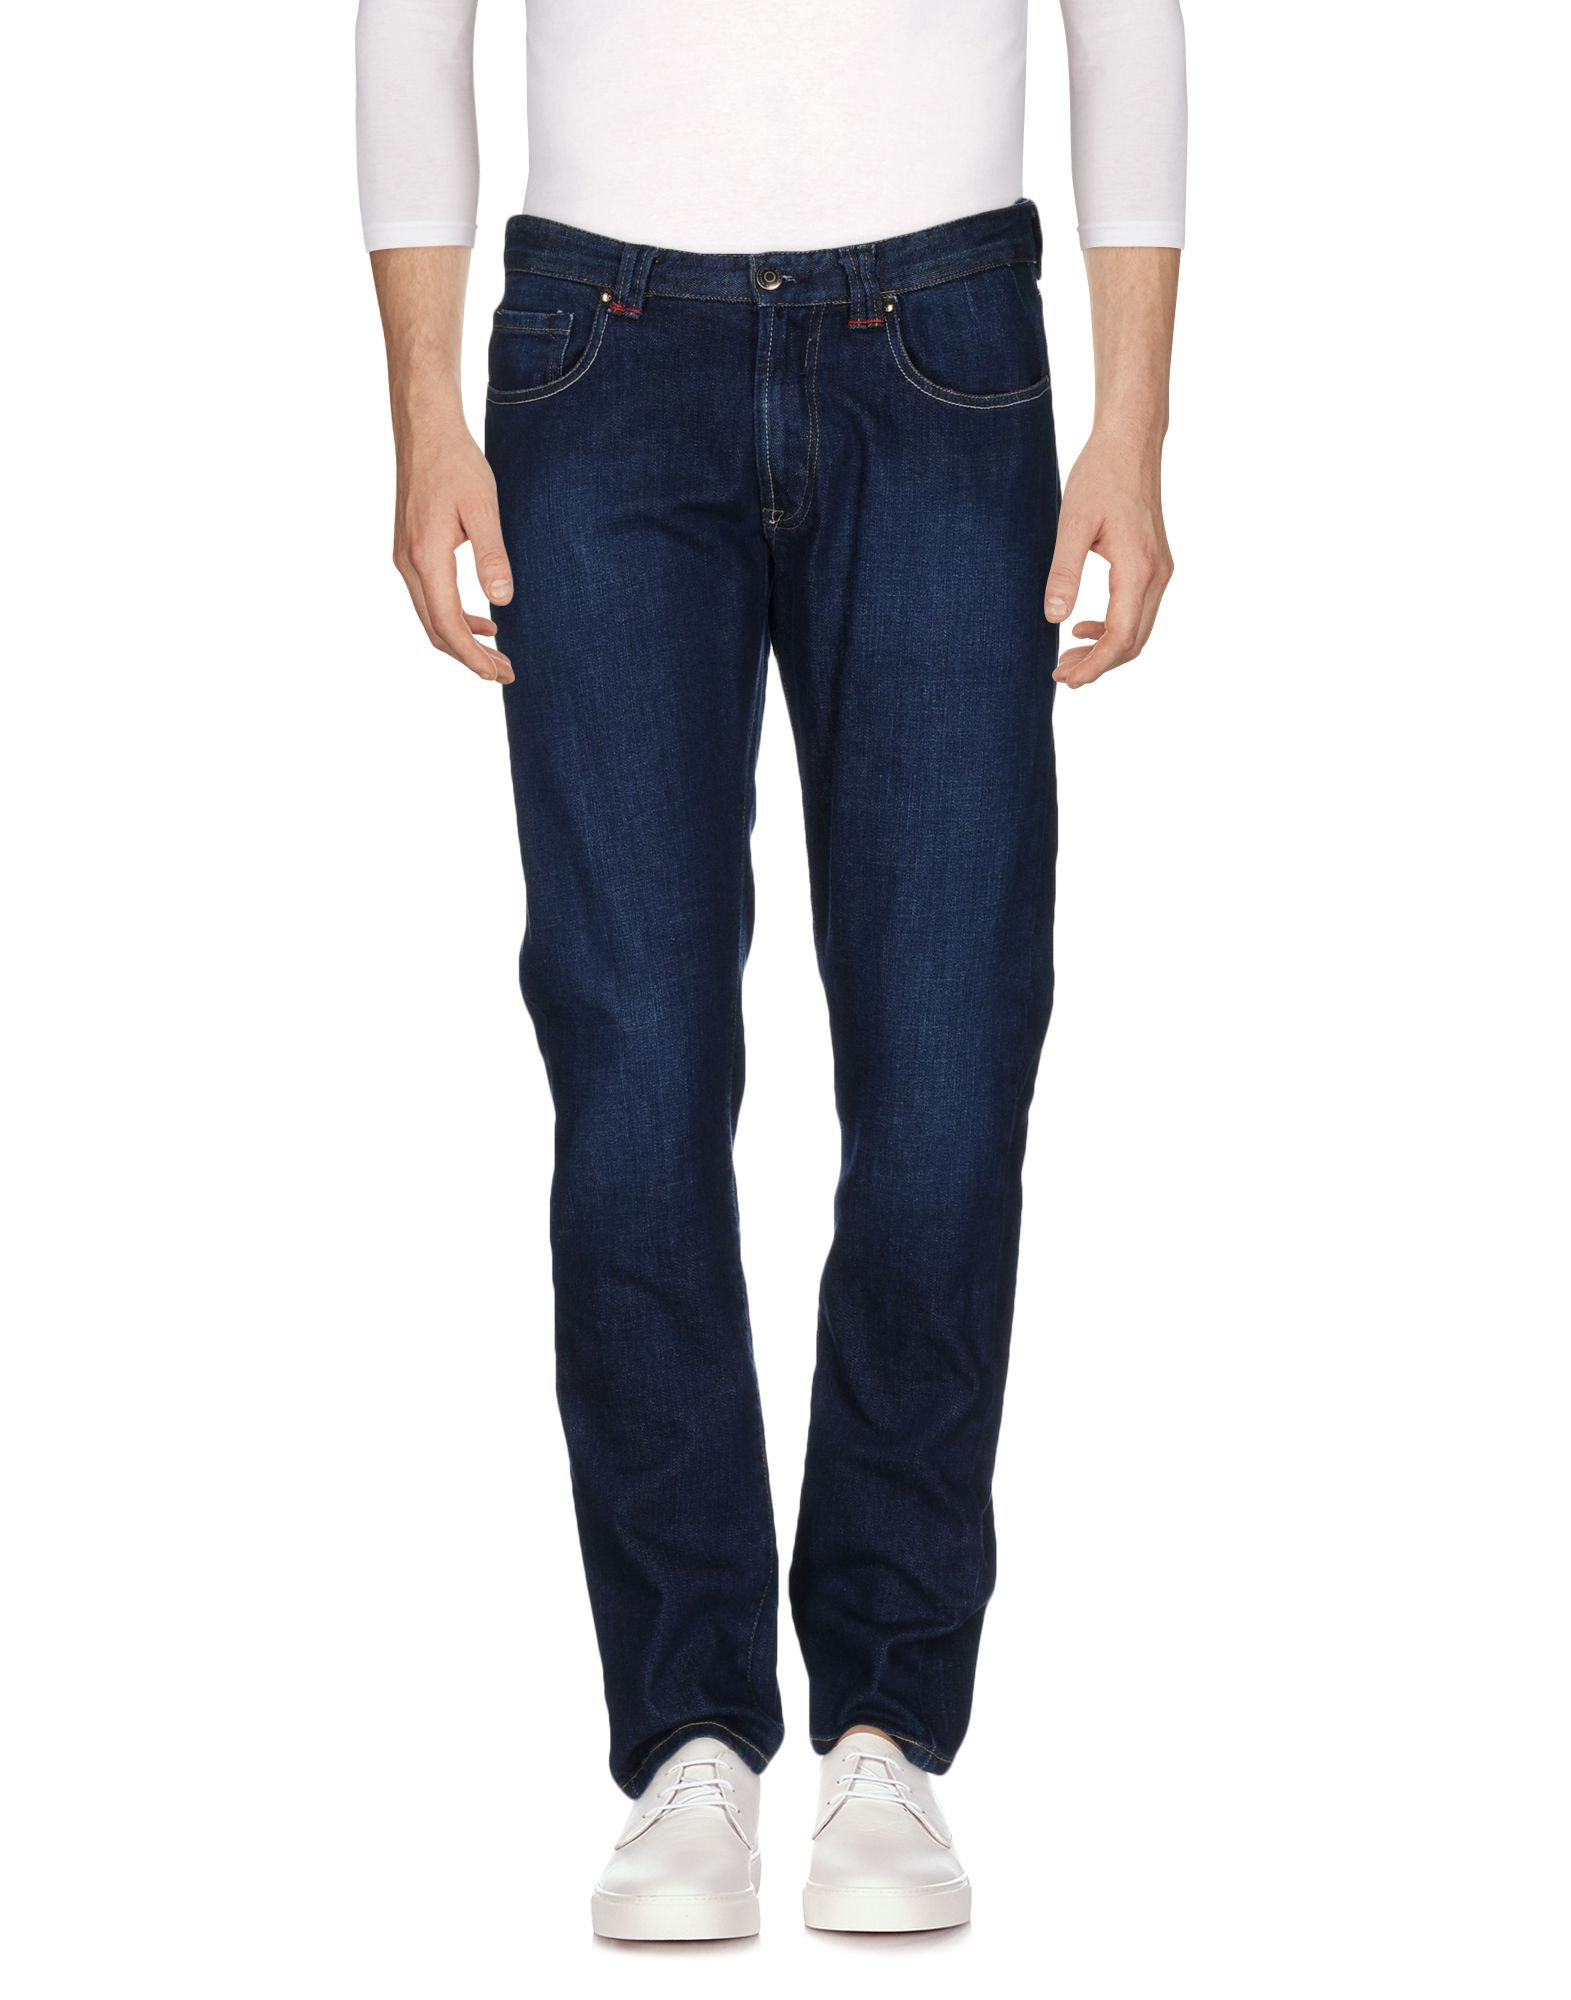 Pantaloni Jeans Ballantyne Uomo - Acquista online su